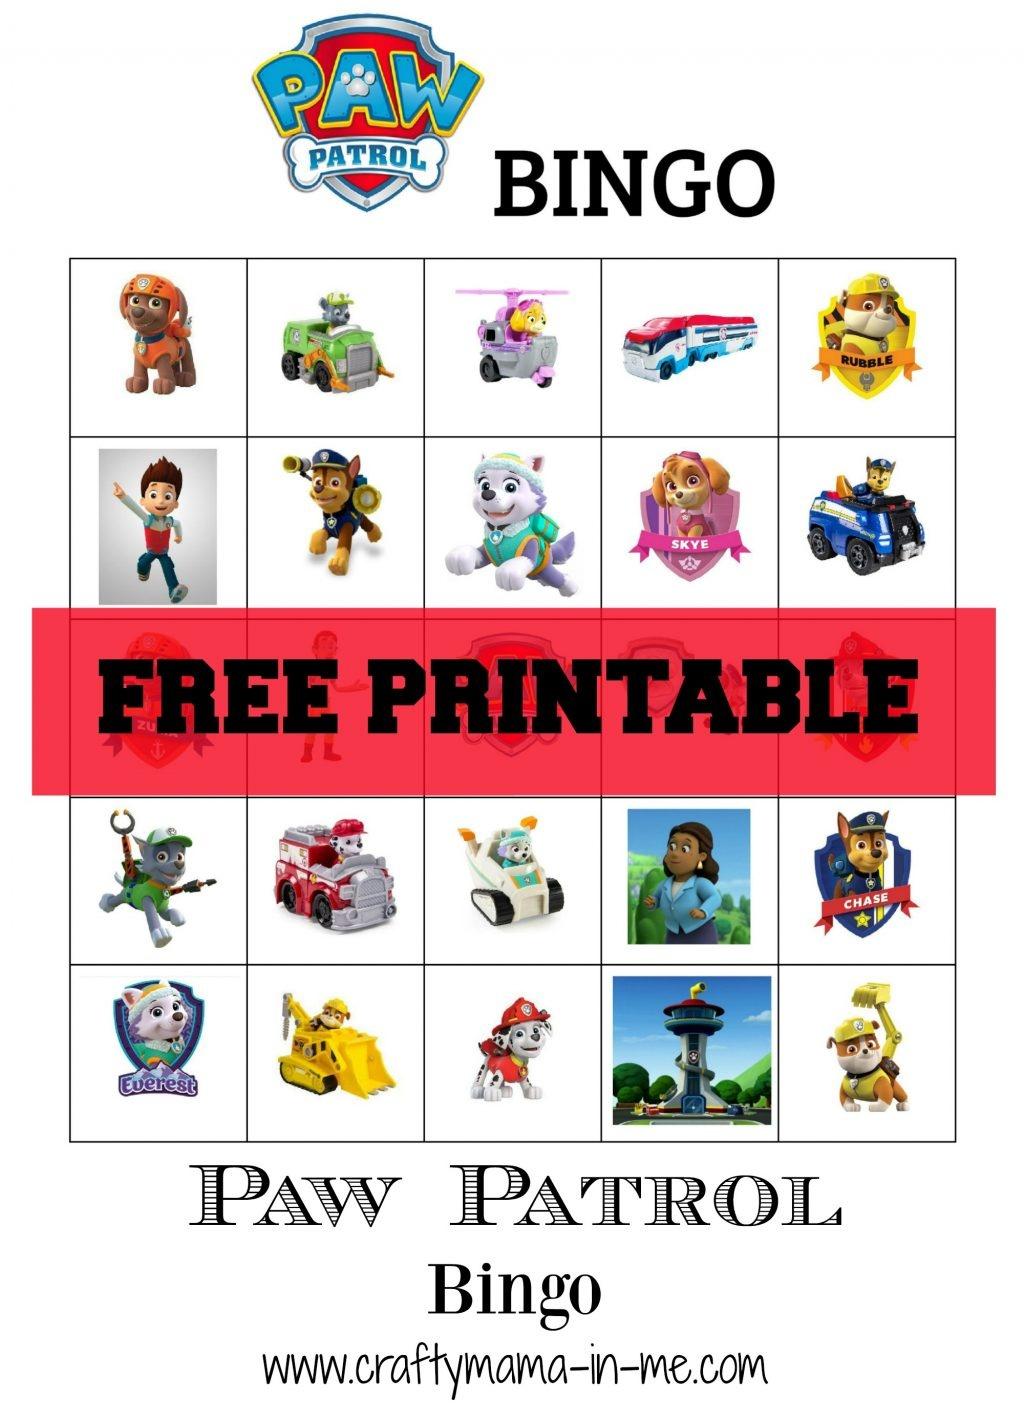 Free Printable Paw Patrol Bingo - Crafty Mama In Me! - Free Paw Patrol Printables